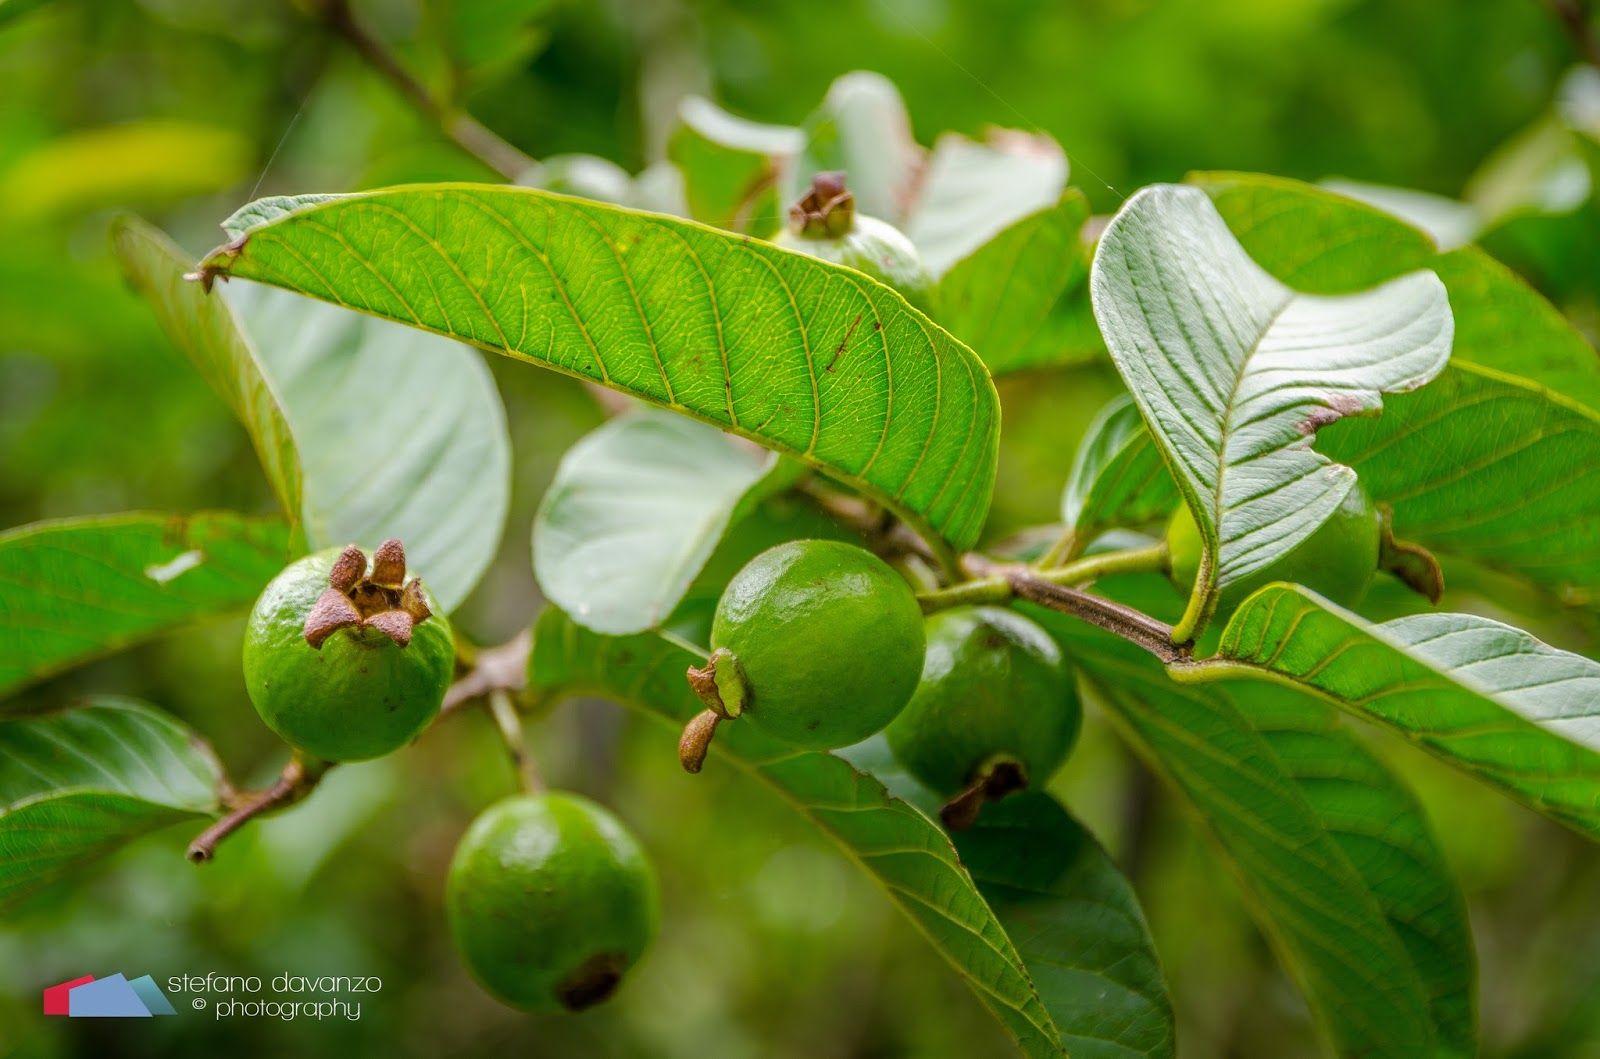 Stefanodav's Shot-Blog: Green Berries... #stefanodav #maui #hawaii #iamnikon #nikonphotography #travel #travelphotography #blogger #beautifulplace #placetovisit #usa #gohawaii